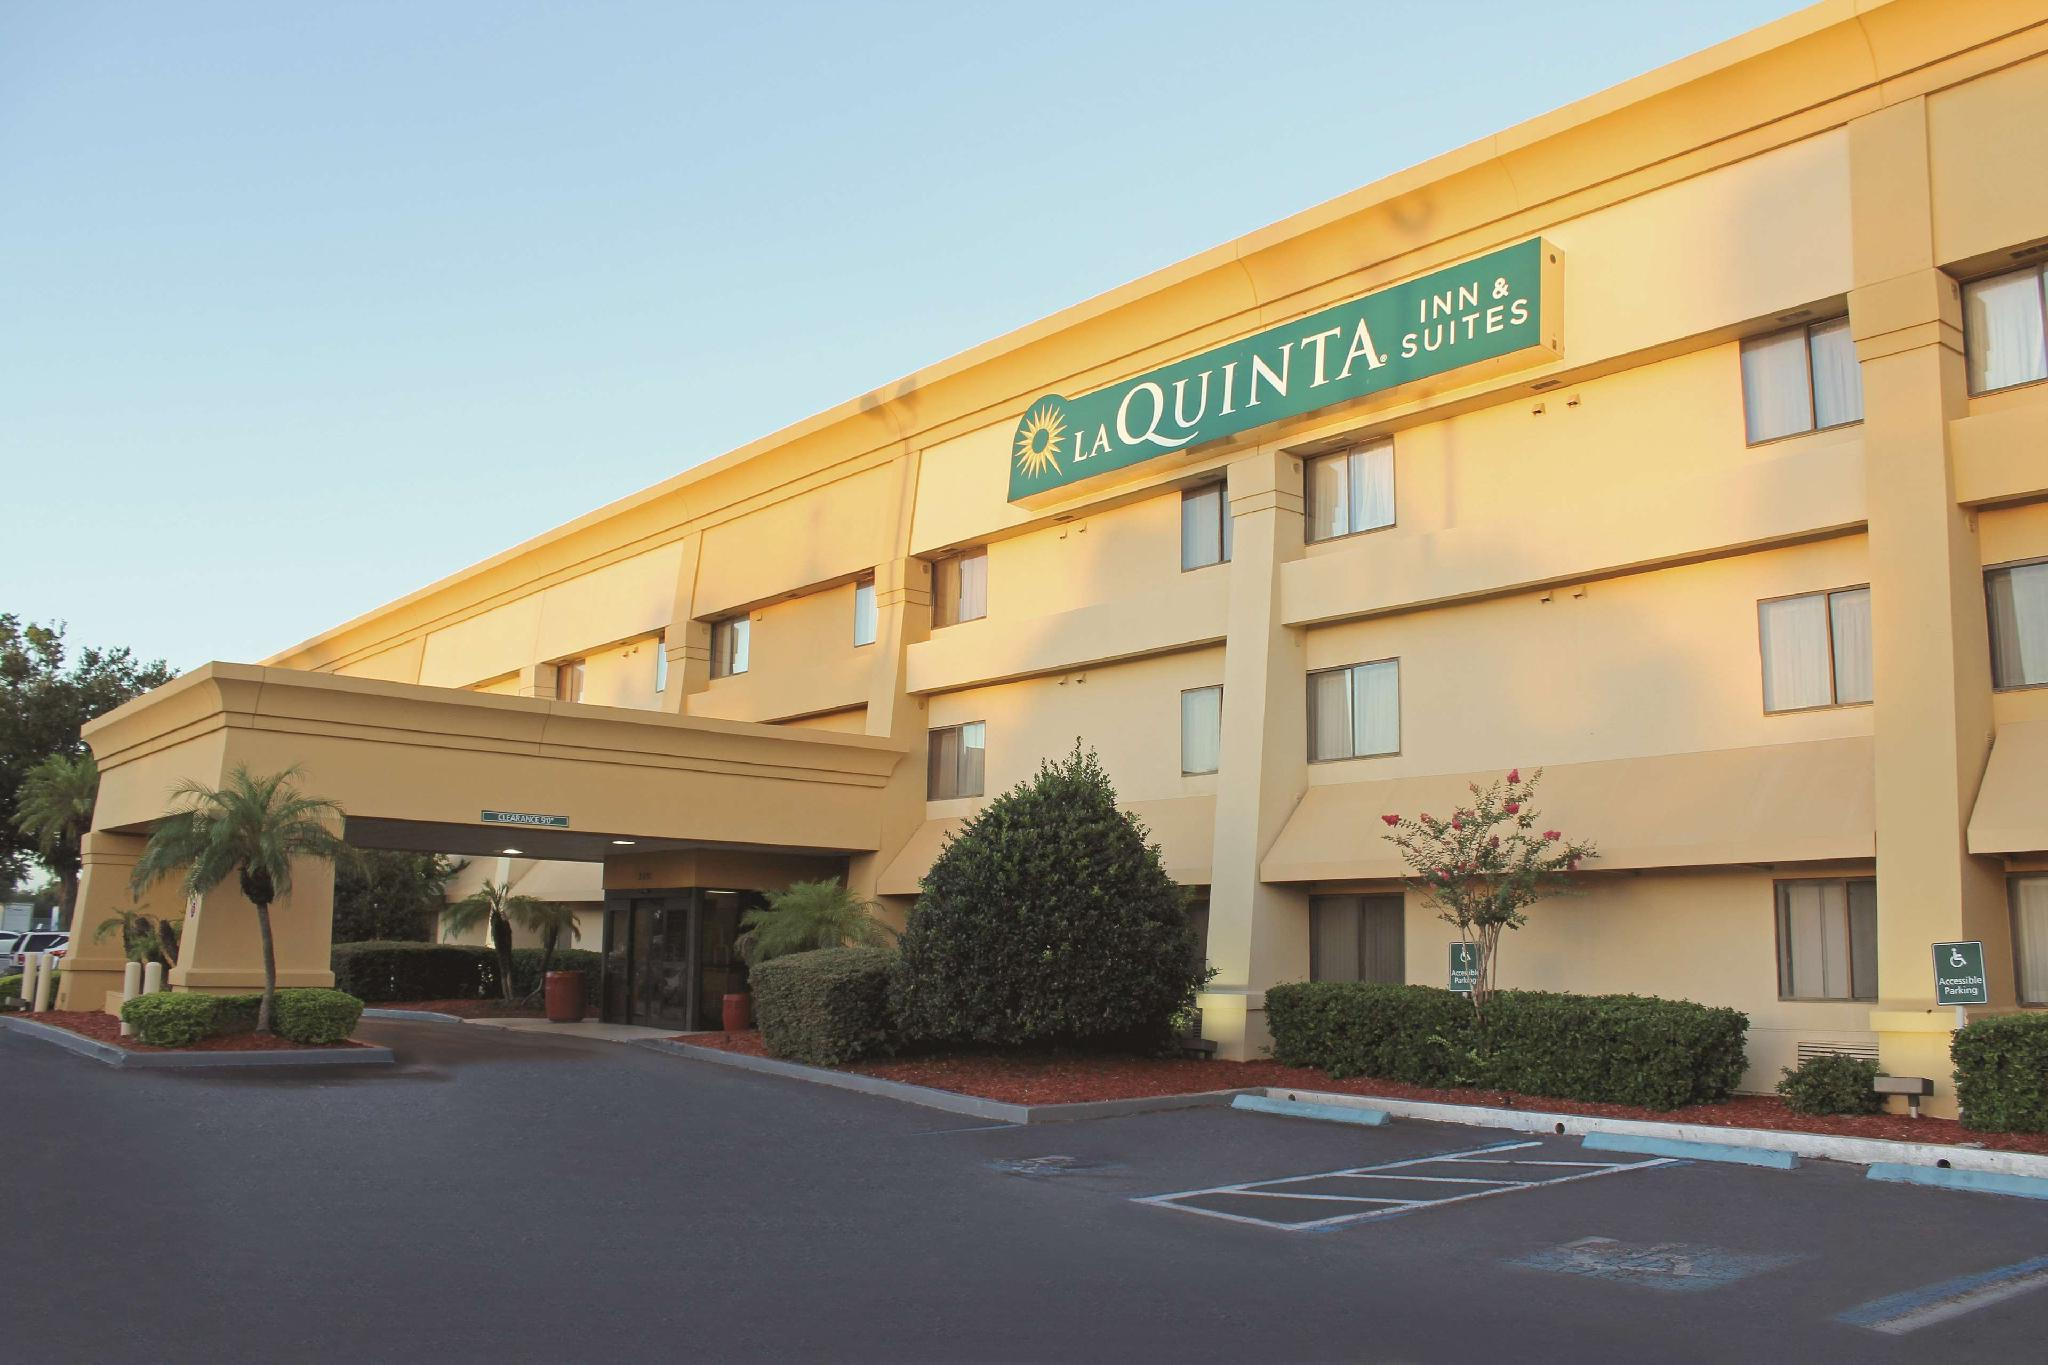 La Quinta Inn And Suites By Wyndham Orlando South